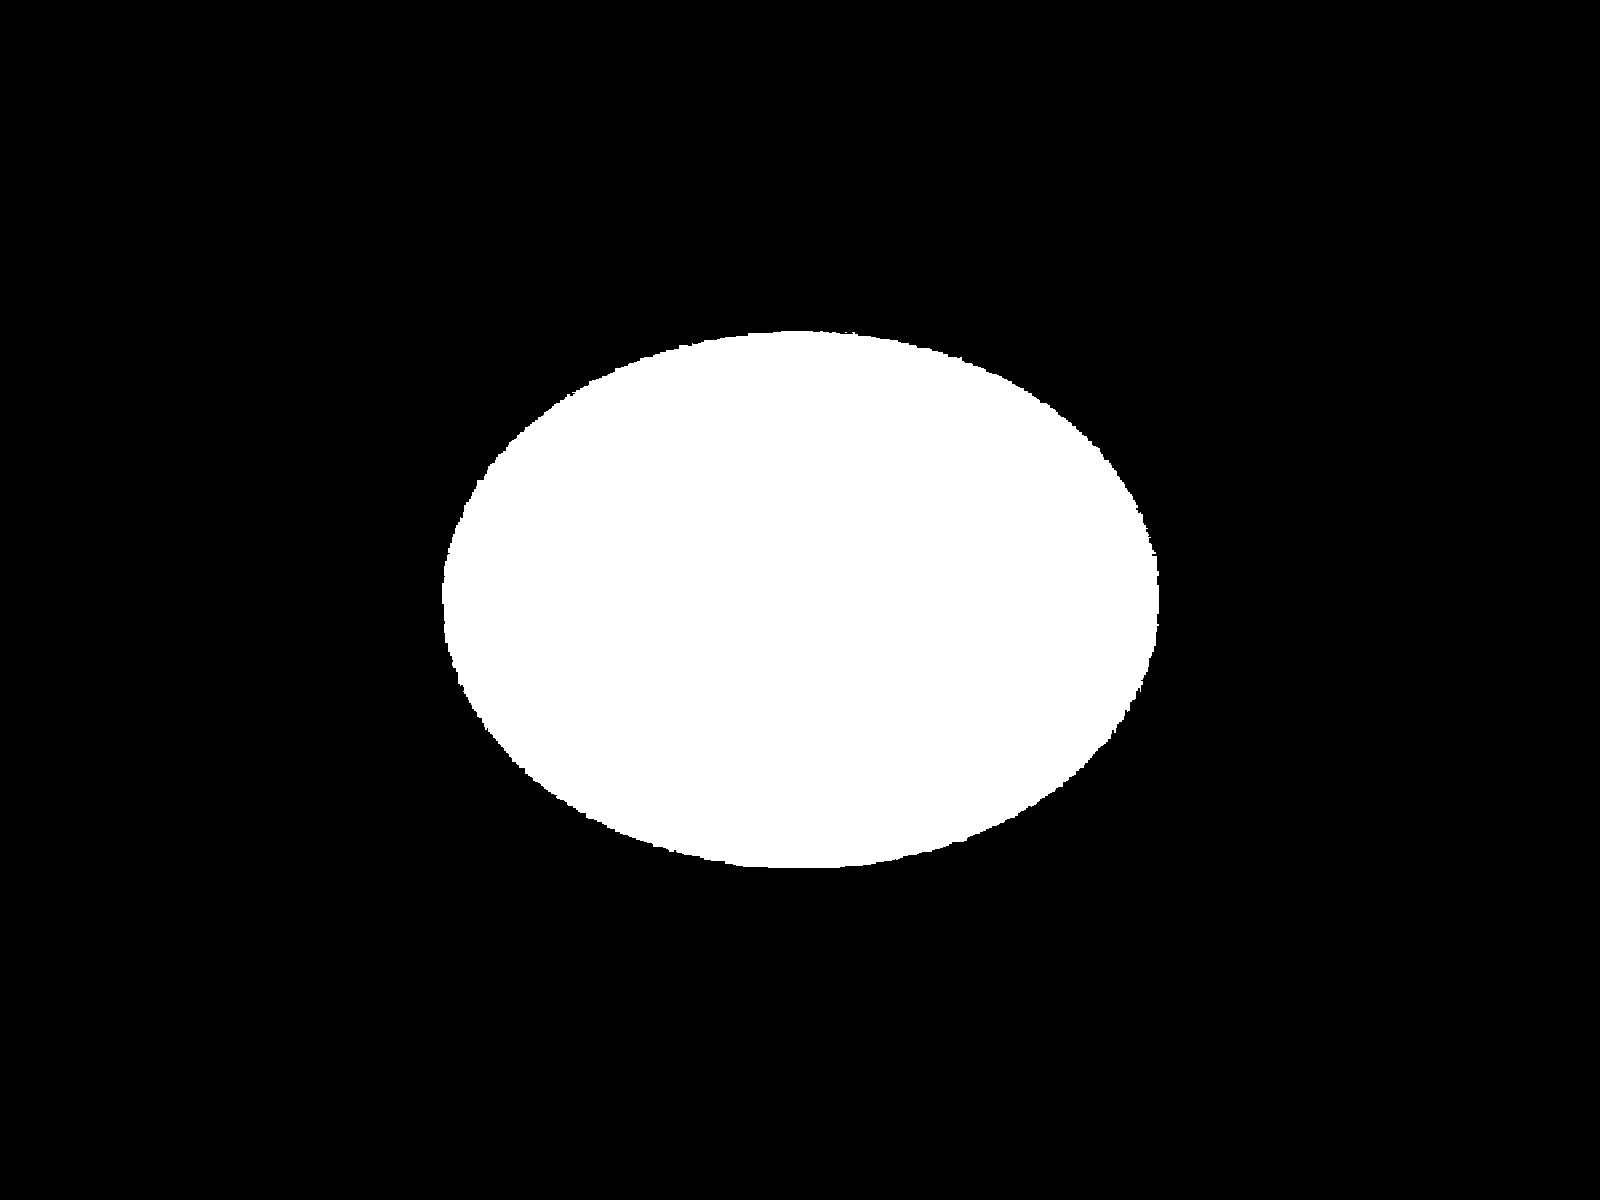 Click image for larger version.  Name:13 black oval vignette.png Views:33896 Size:179.1 KB ID:3680